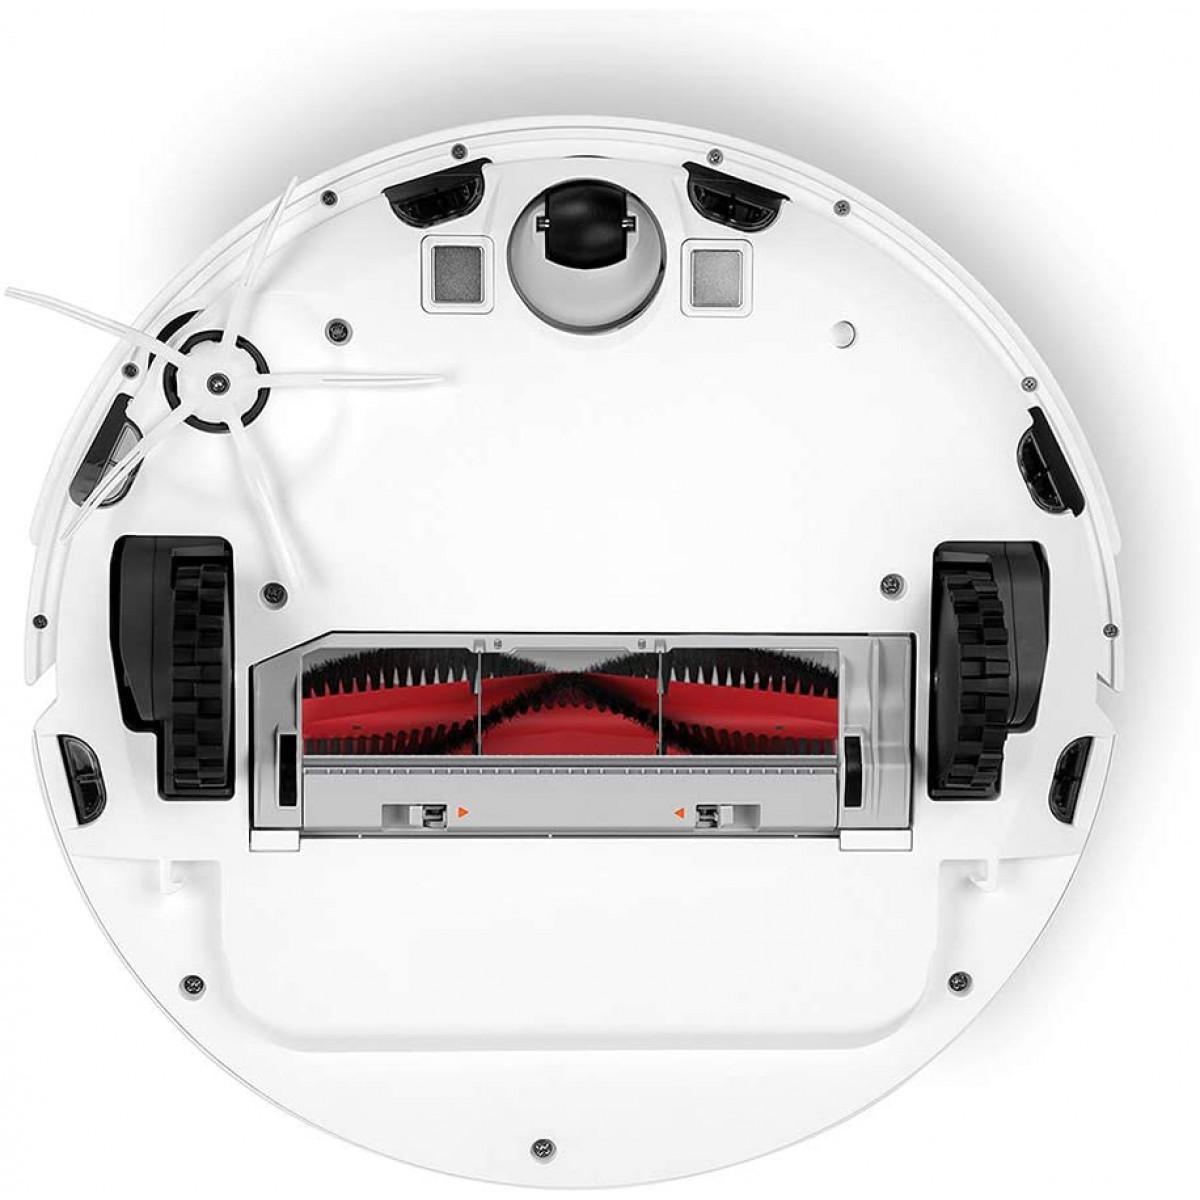 Roborock stranka krtača za S6 MaxV, S6, S6 Pure, E4, S5 Max 2x bela